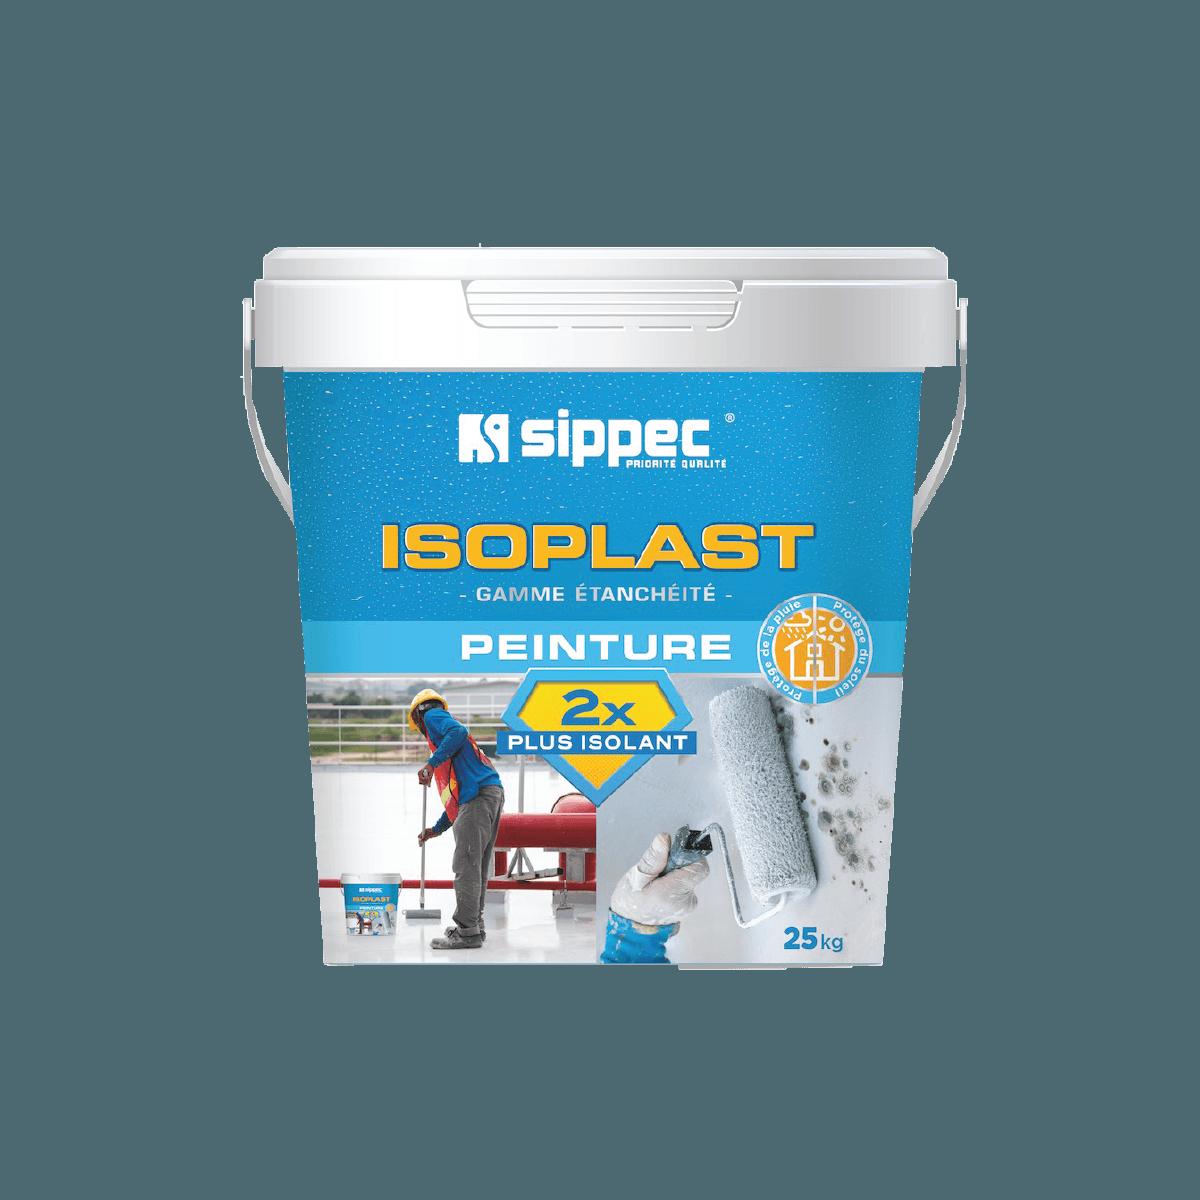 Sippec Isoplast